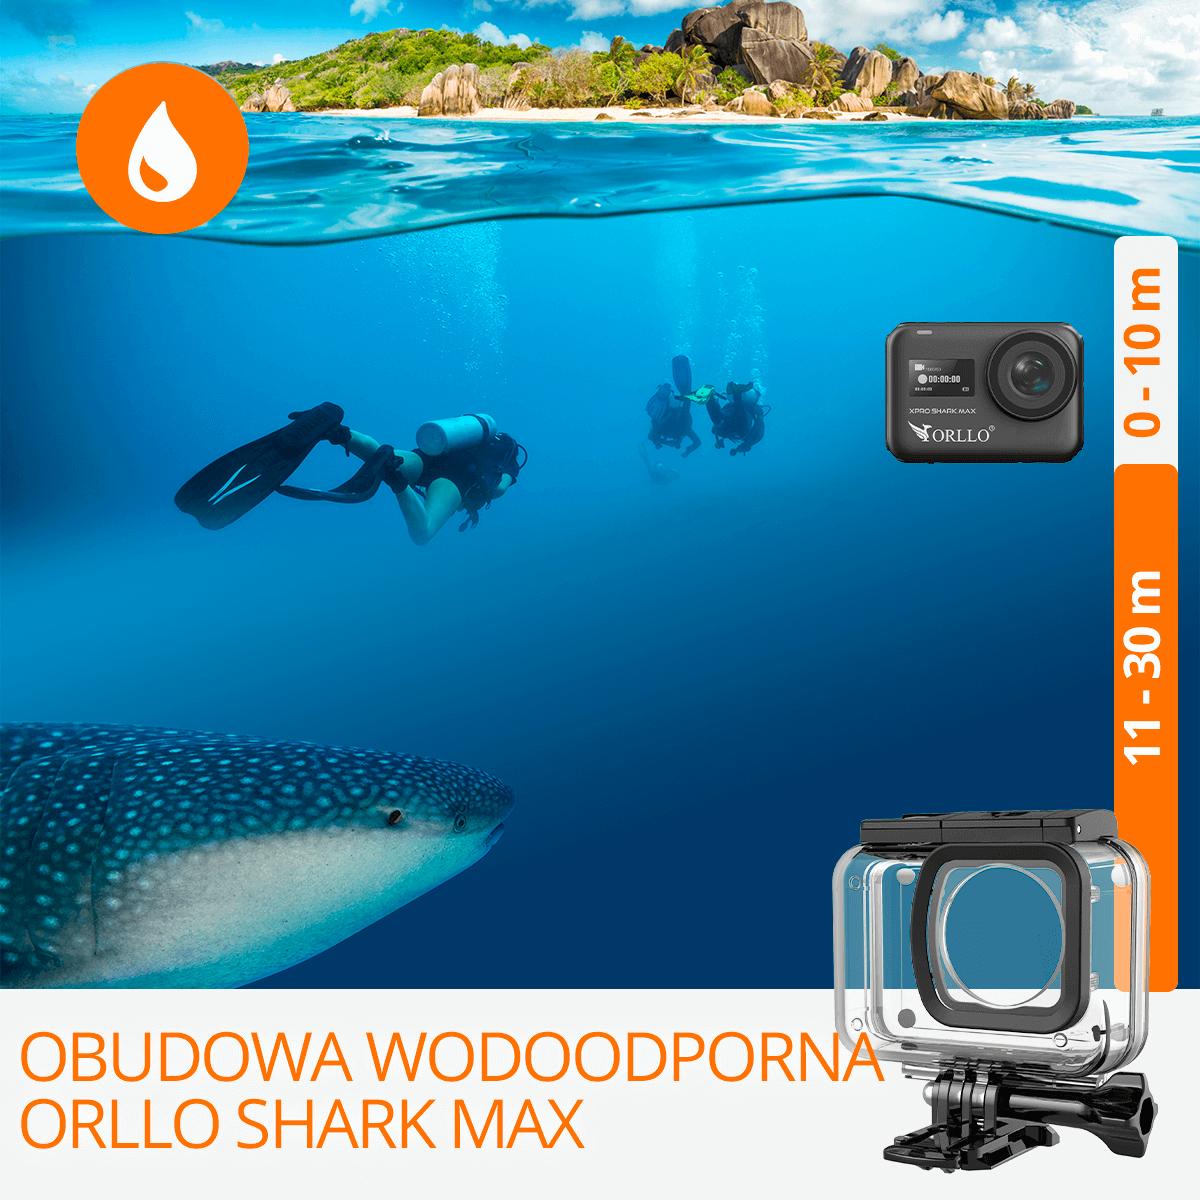 obudowa-zanurzeniowa-do-orllo-xpro-shark-max